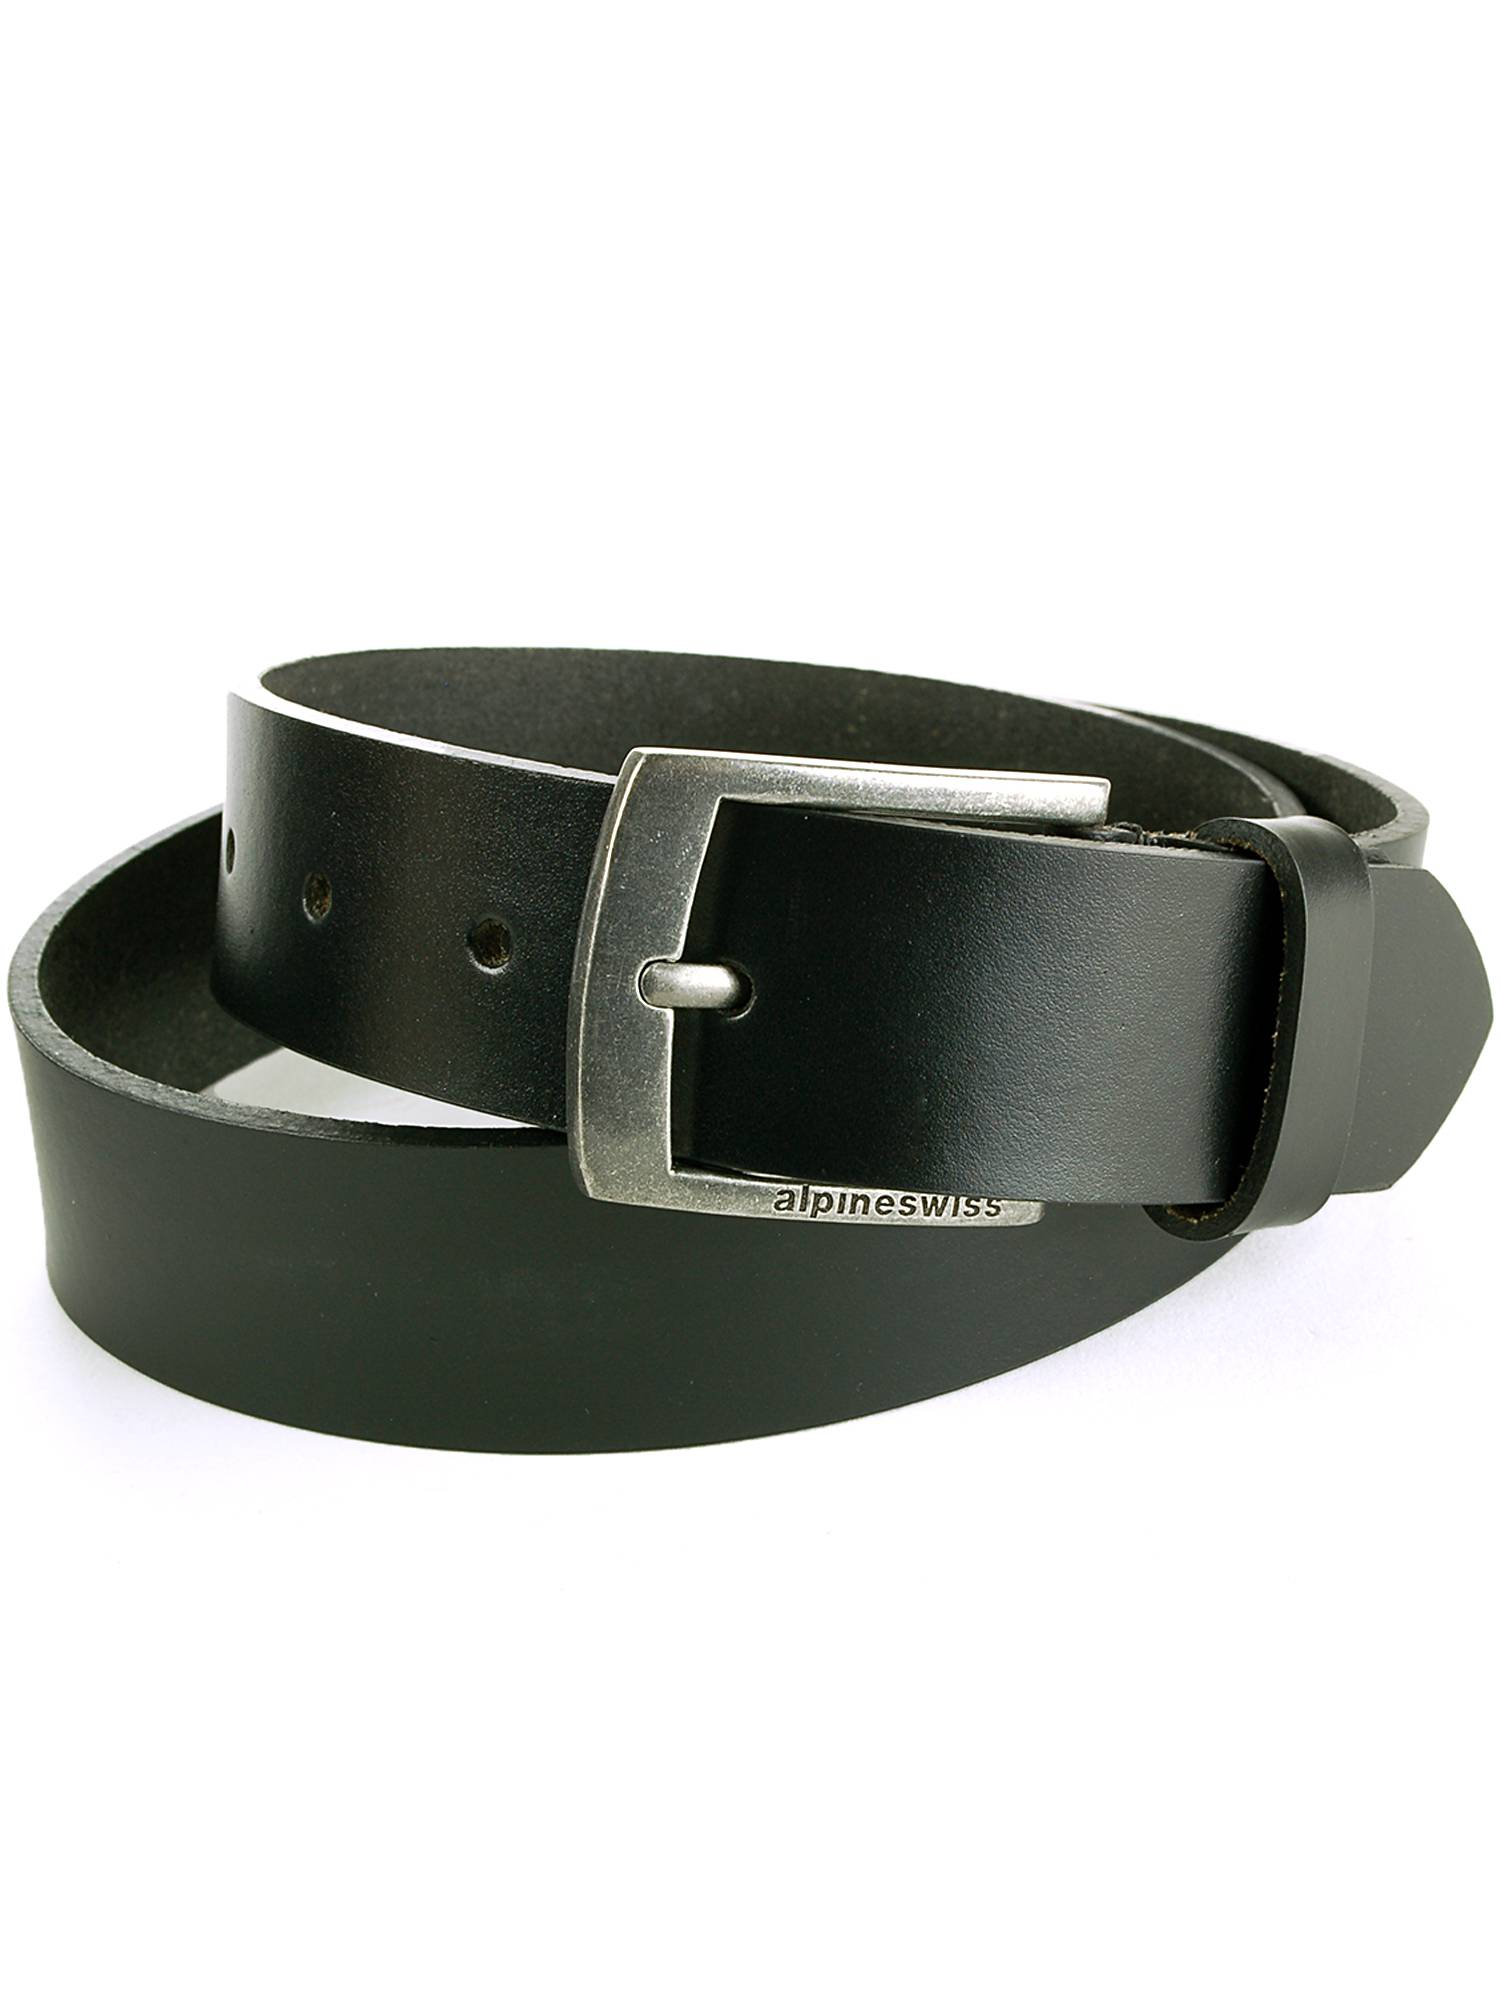 "Alpine Swiss Men's Leather Belt Slim 1 1/4"" Casual Jean Dakota Signature..."